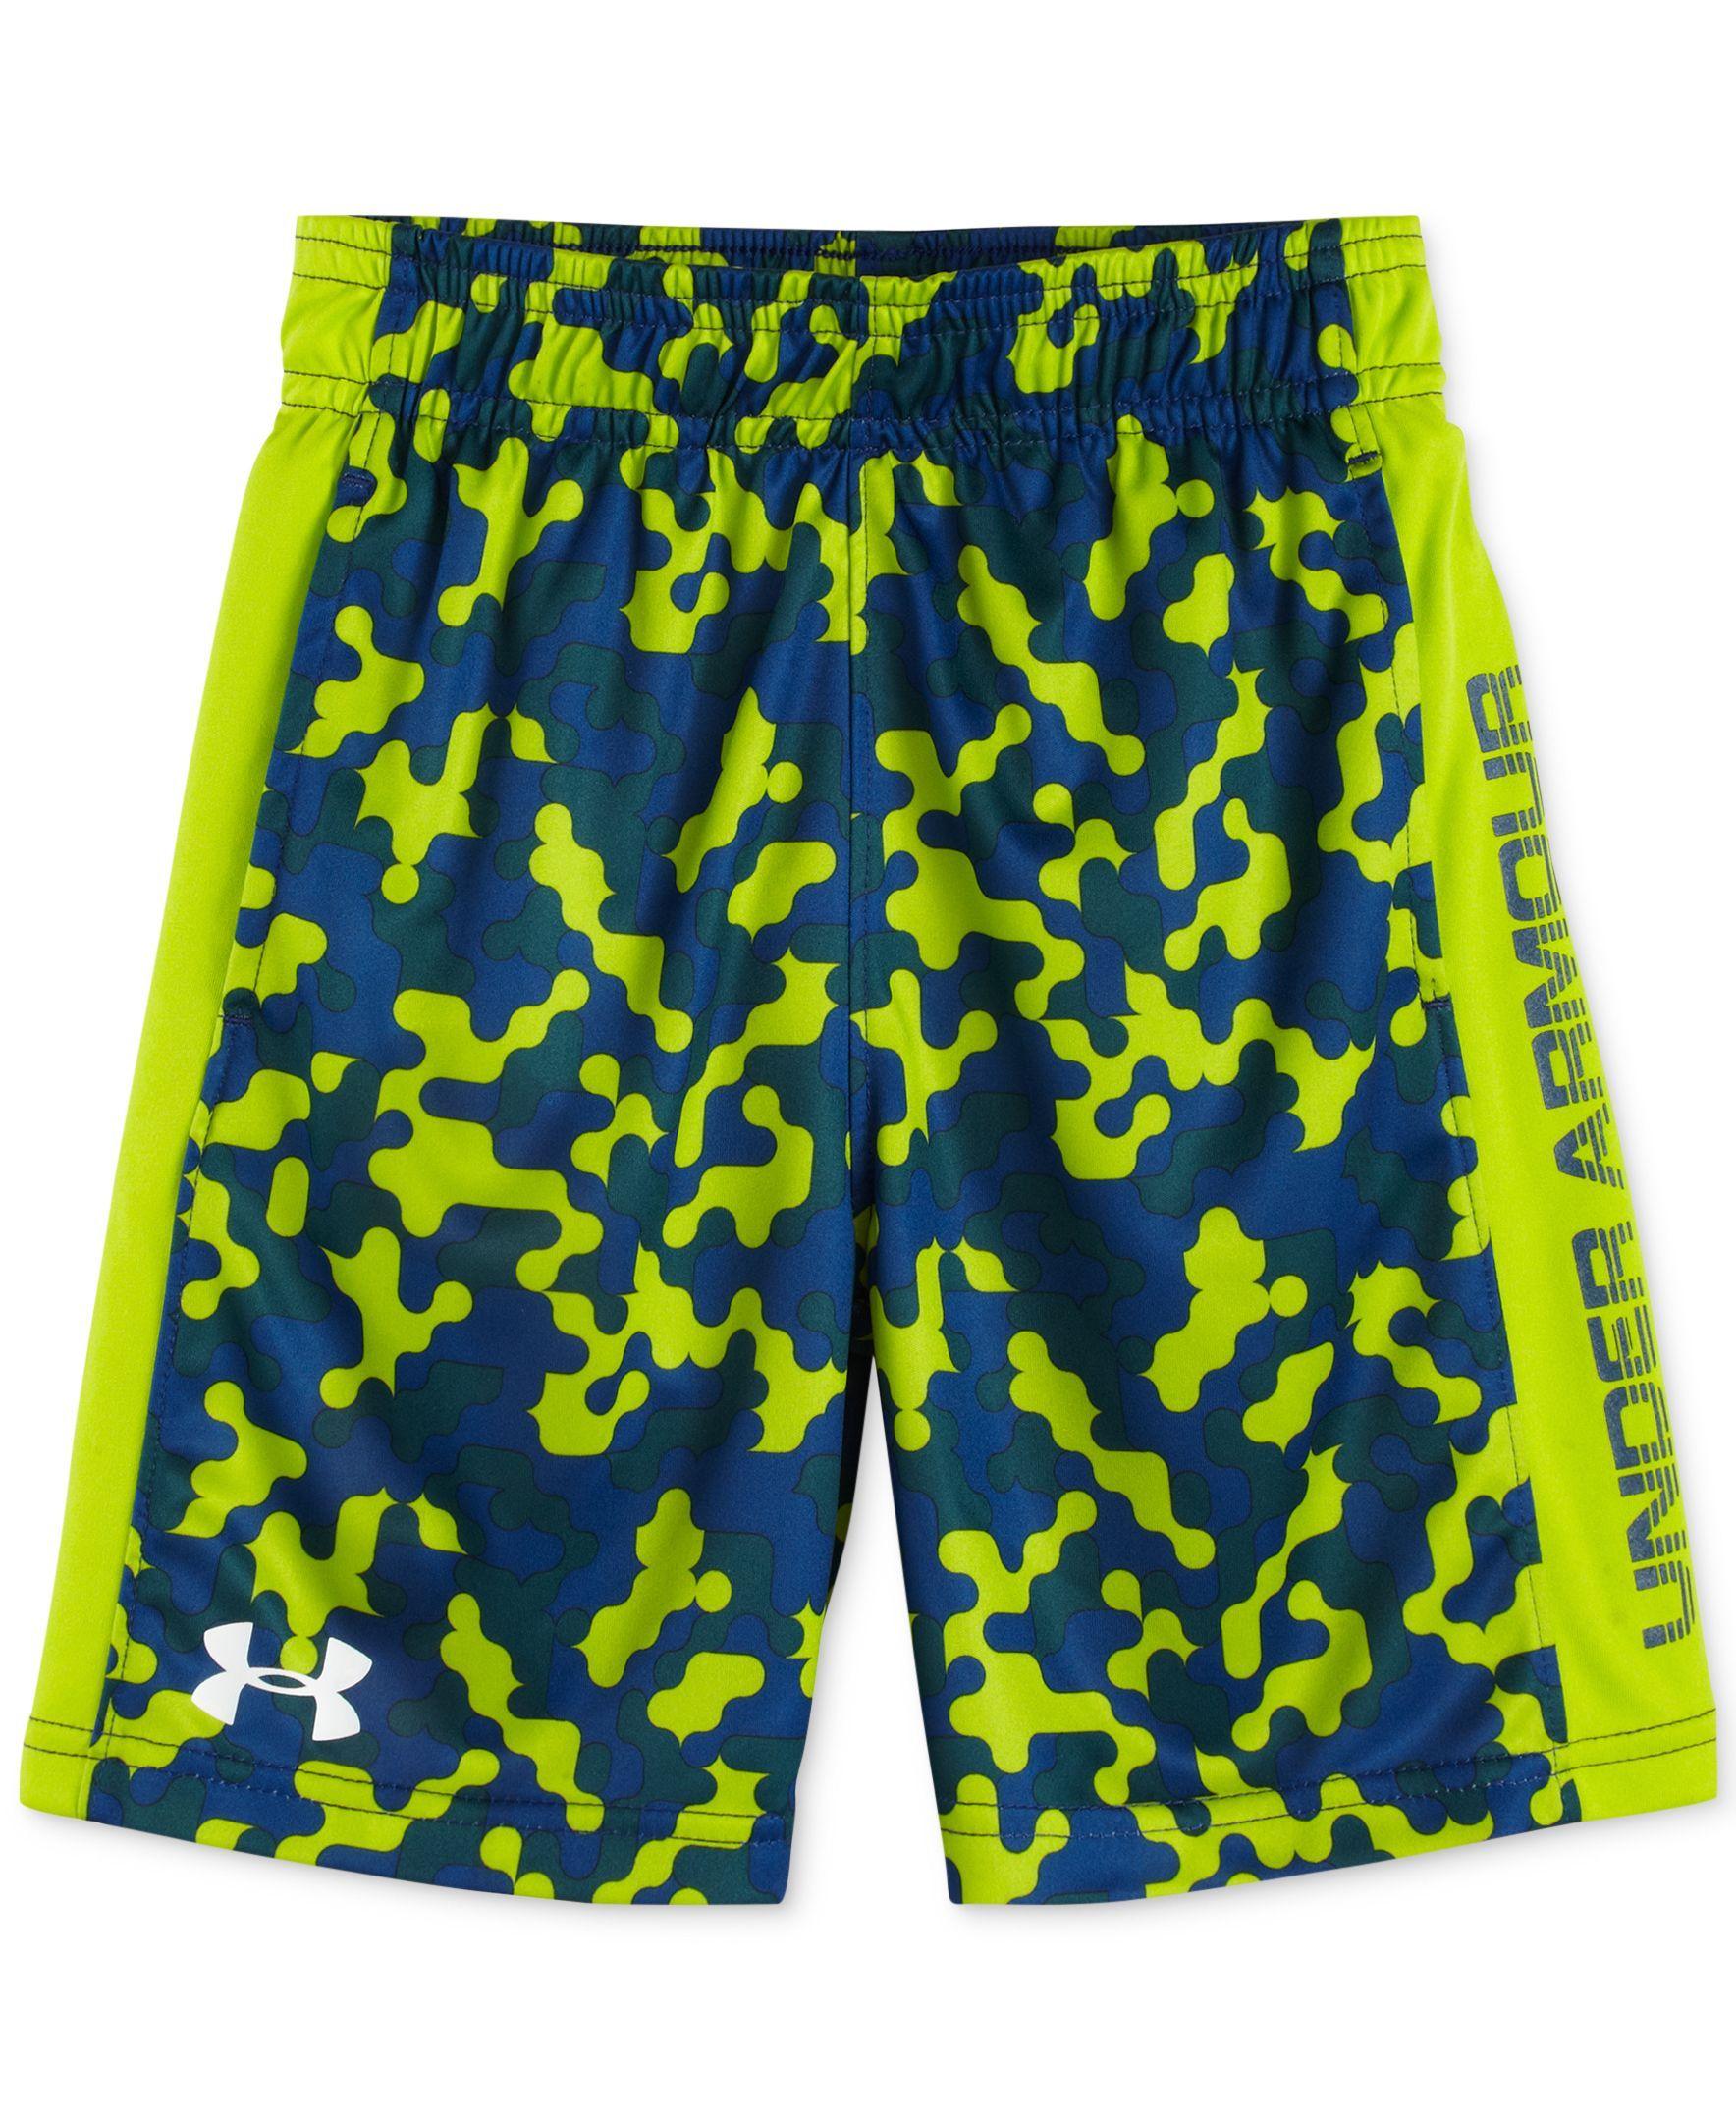 Under Armour Little Boys' Eliminator Camo Shorts